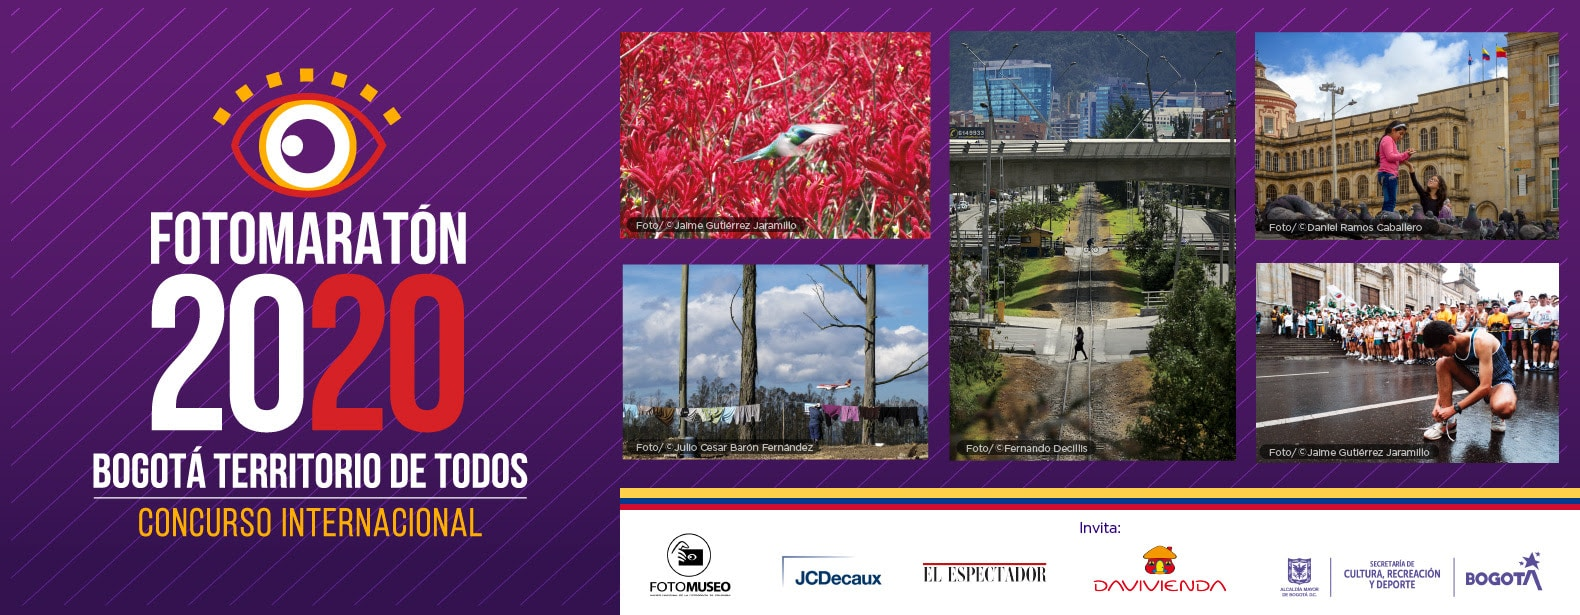 fotomaratón 2020 - Fotomuseo